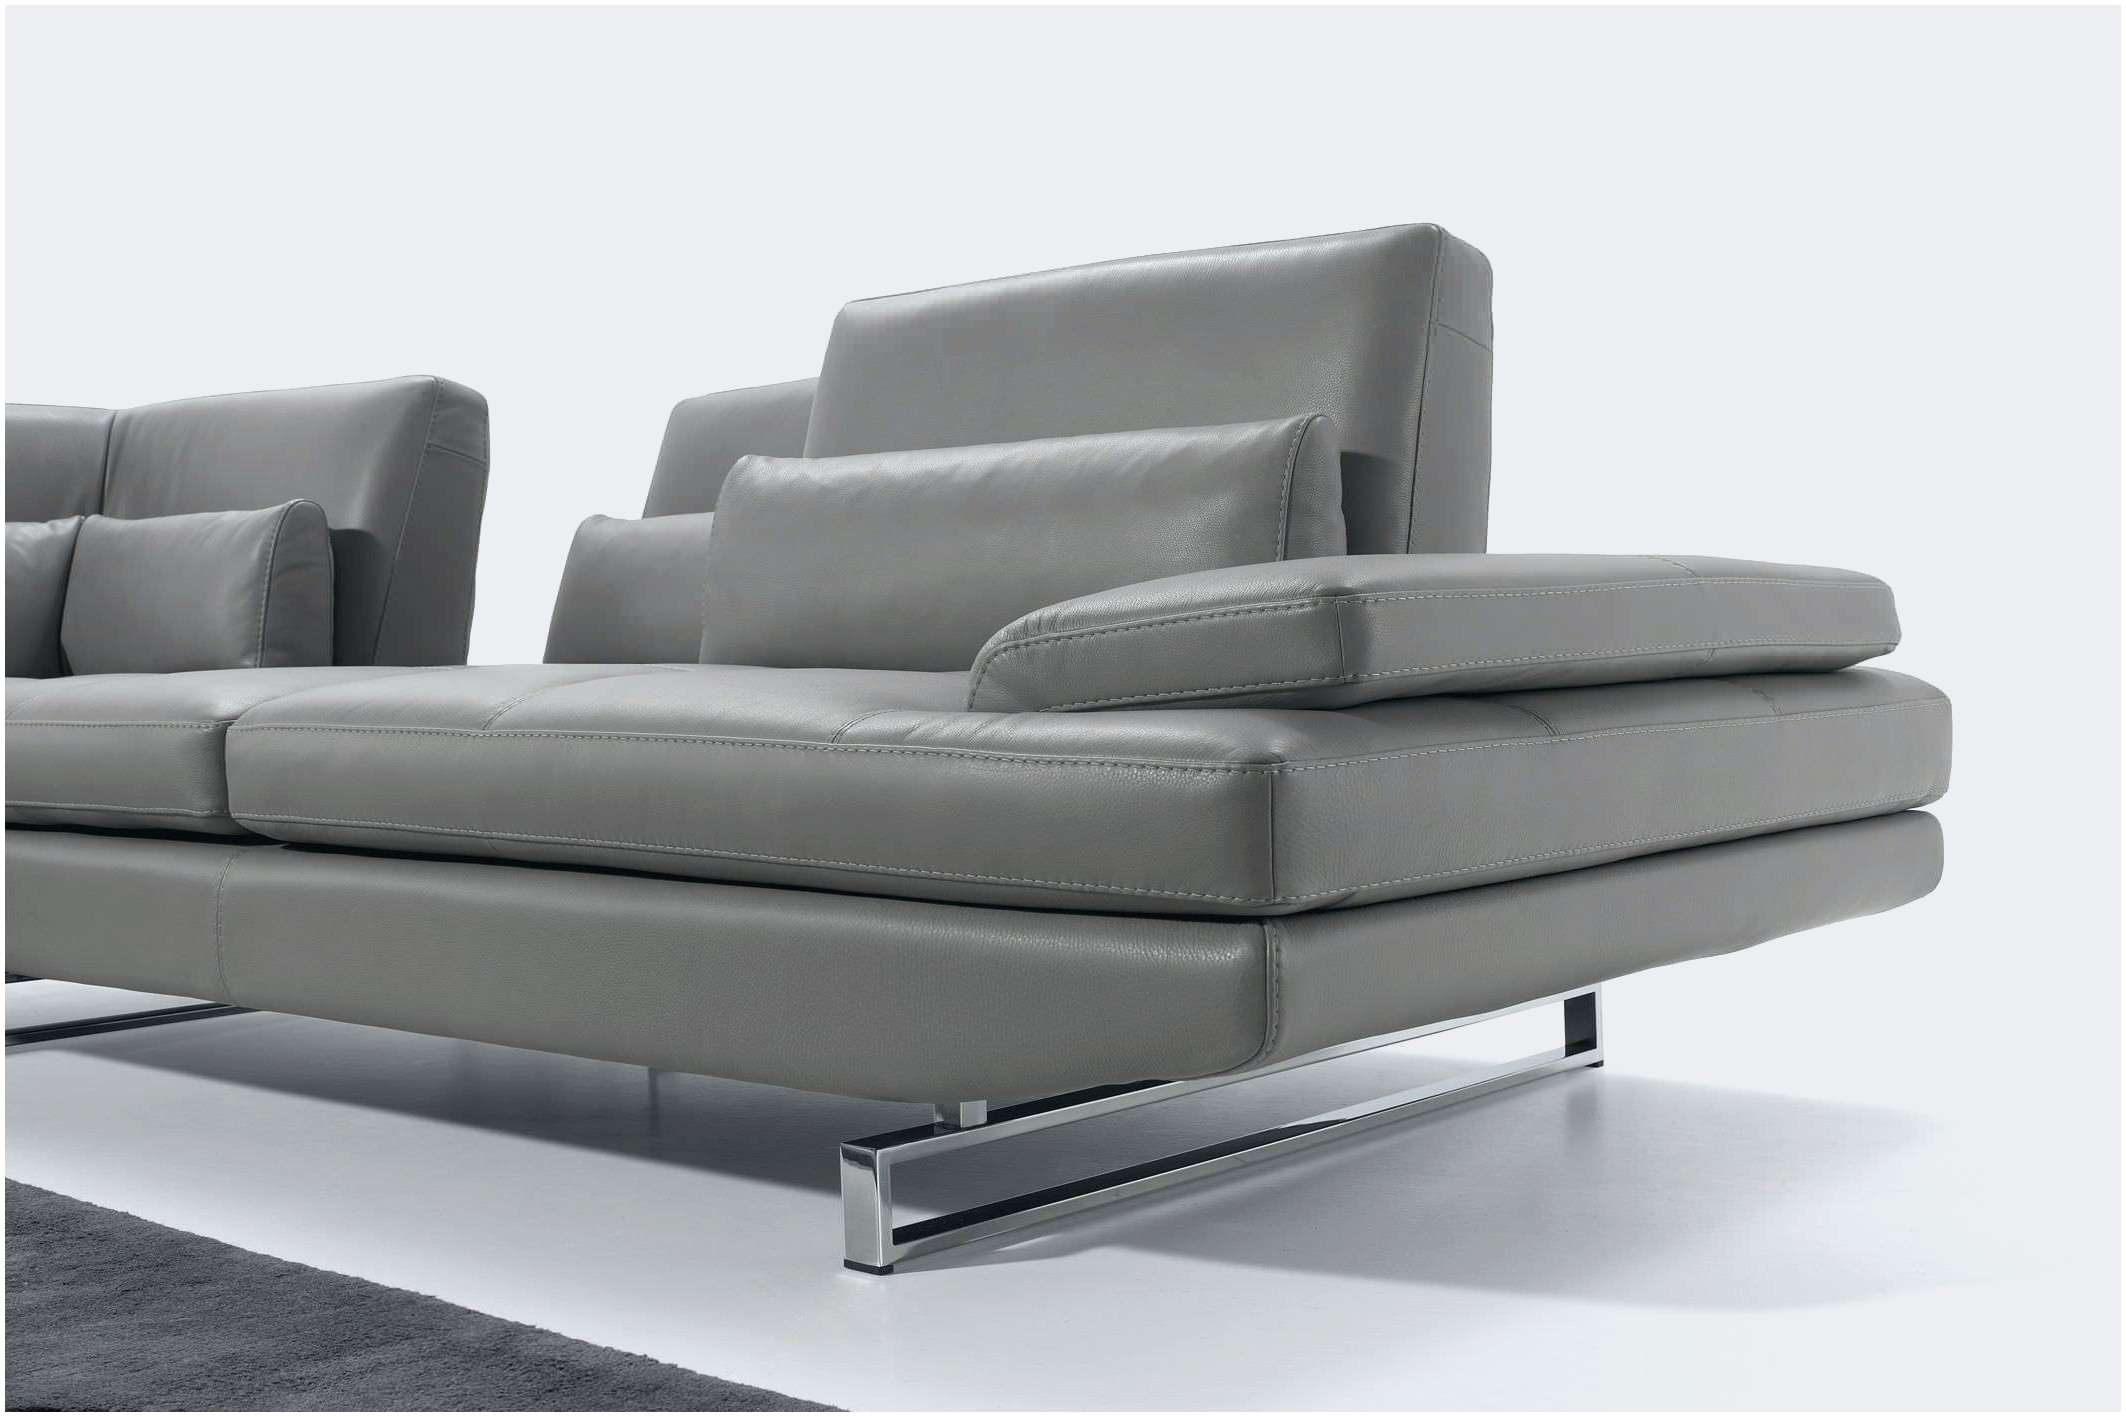 Fly Lit Superposé Belle Jongor4hire Page 101 Of 2056 Home & Interior Design